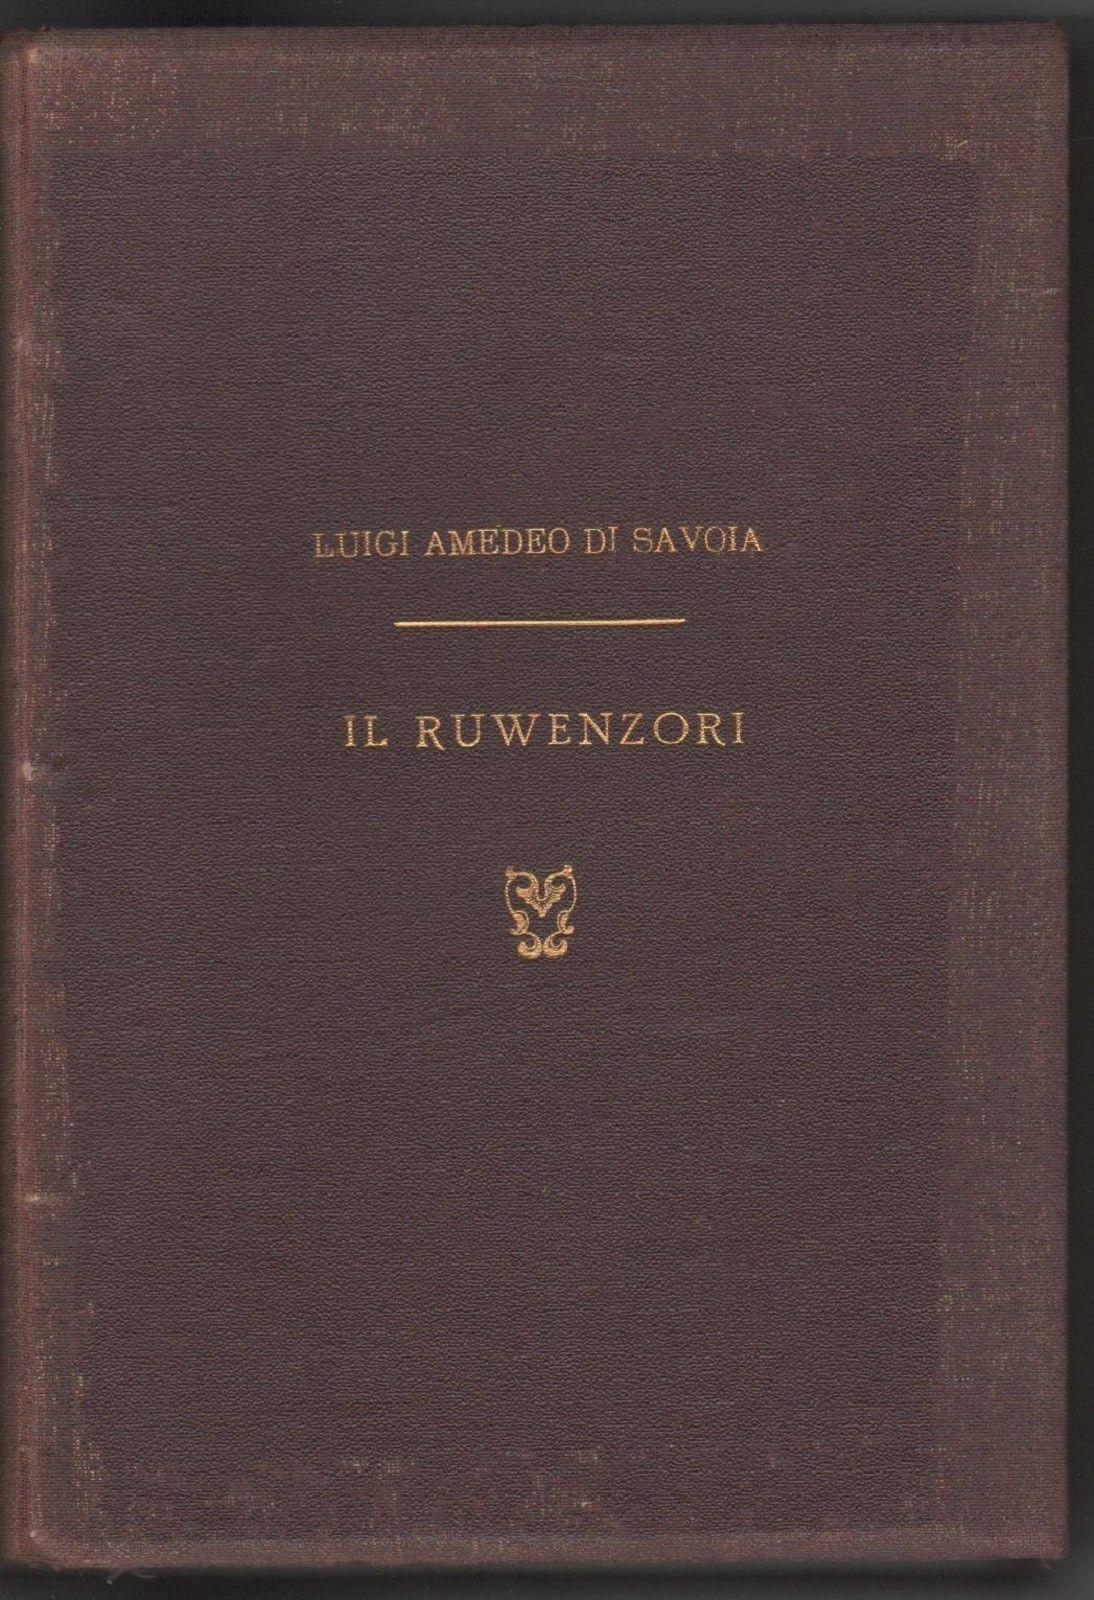 Il Ruwenzori